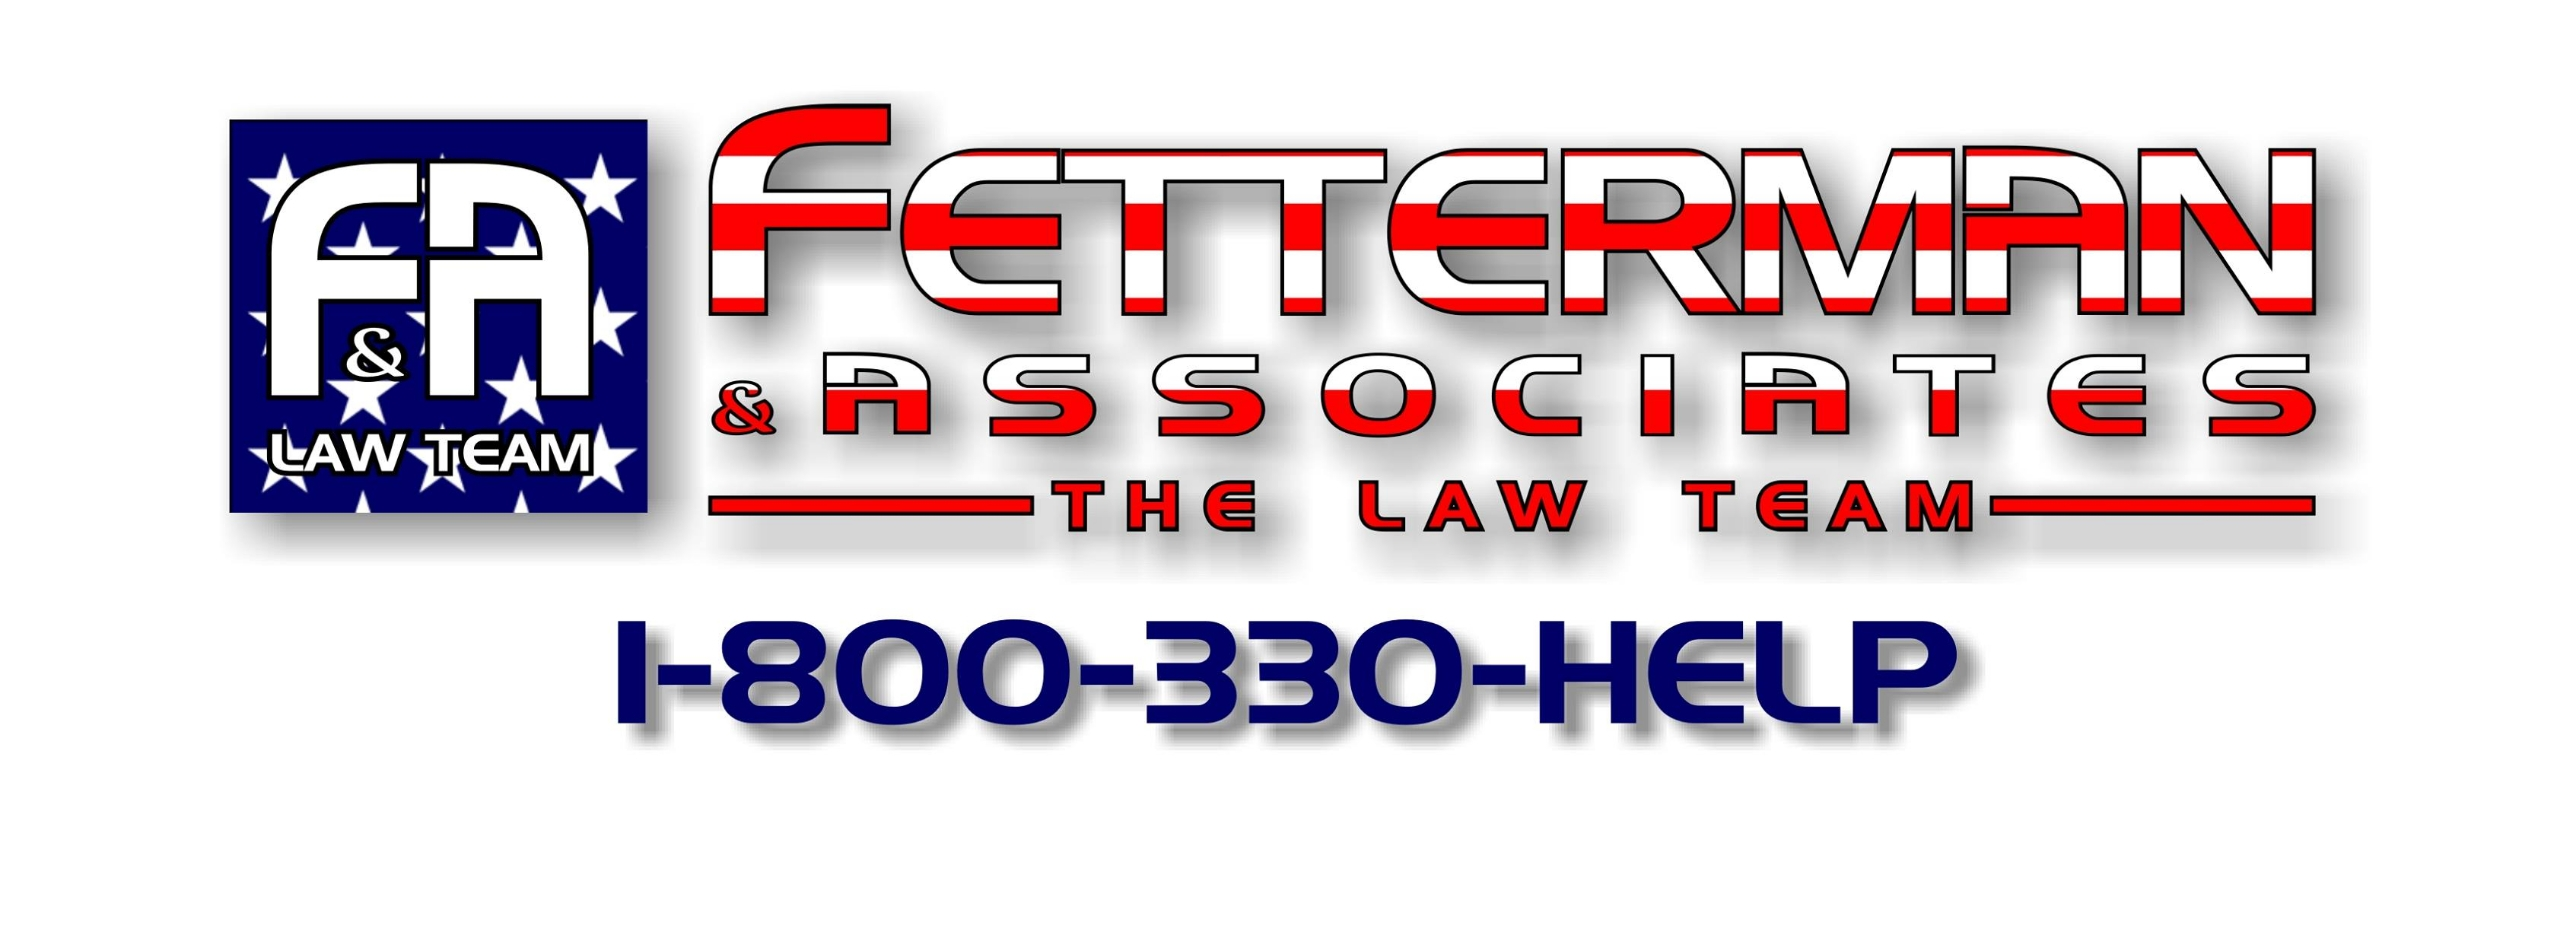 Fetterman & Associates, PA (@lawflteam) Cover Image